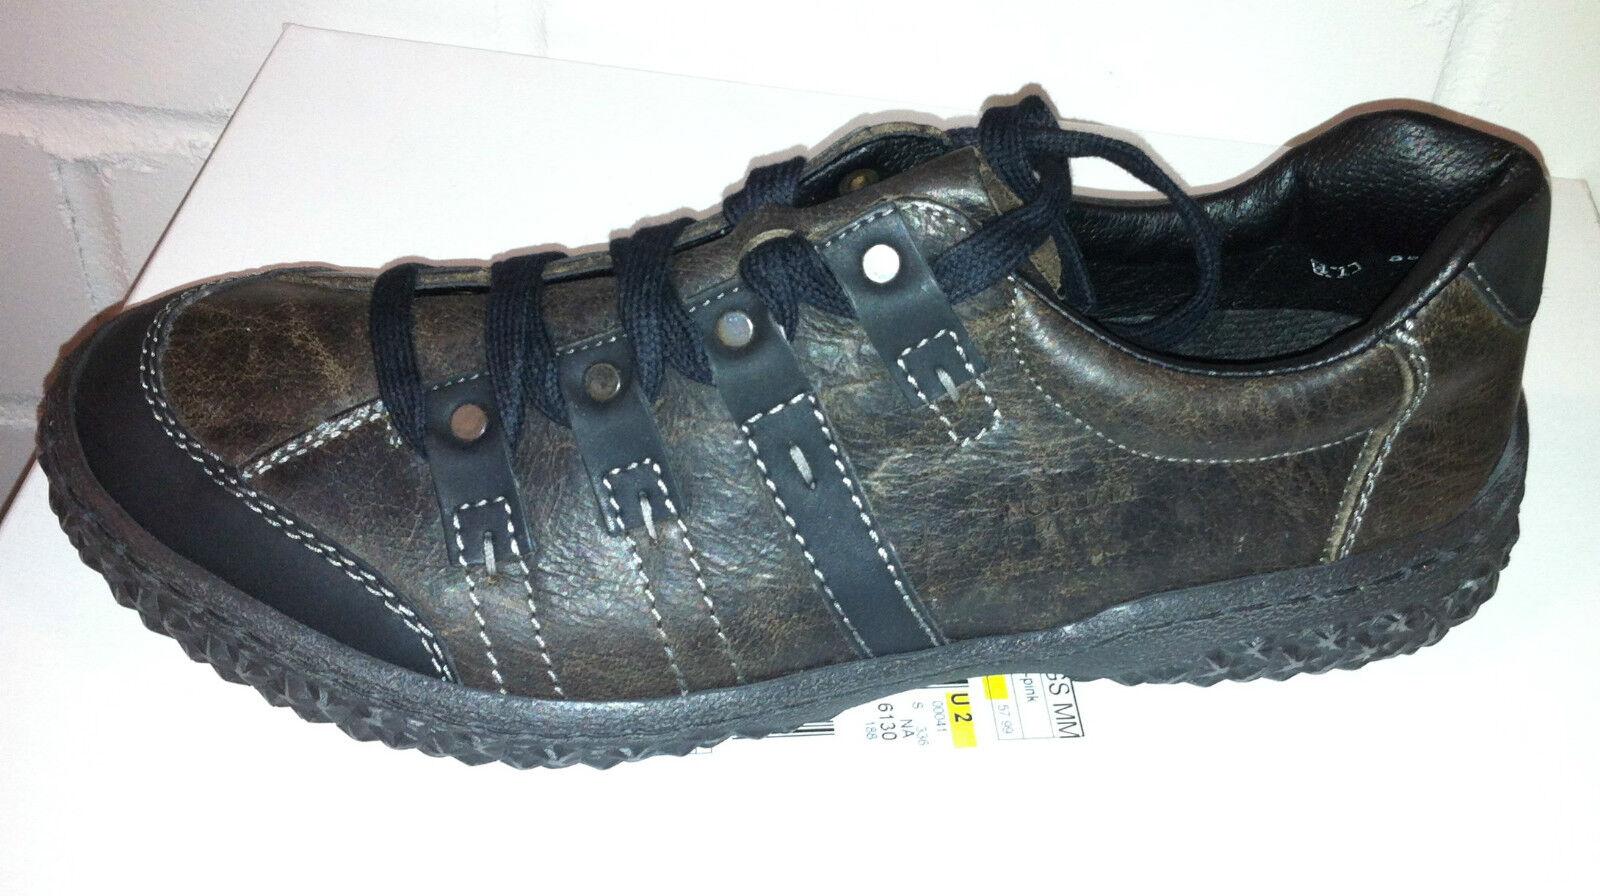 NEU  RIEKER Herrenschuhe Herrenschuhe RIEKER Sneakers Schnürer Halbschuhe EUR 41, dunkelbraun 8fb042